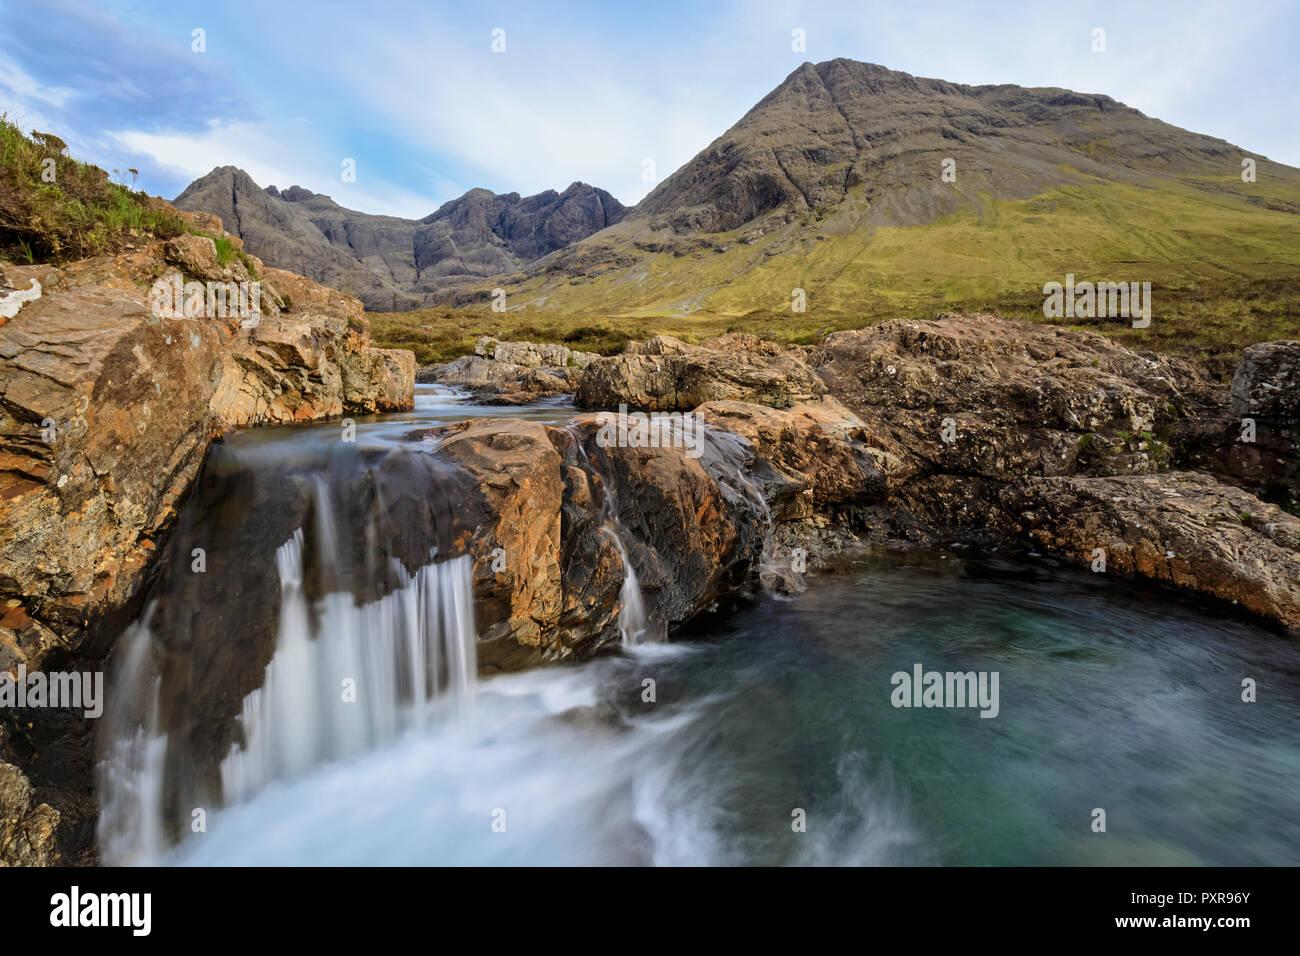 UK, Scotland, Inner Hebrides, Isle of Skye, Glen Brittle, River Brittle, Fairy Pools - Stock Image